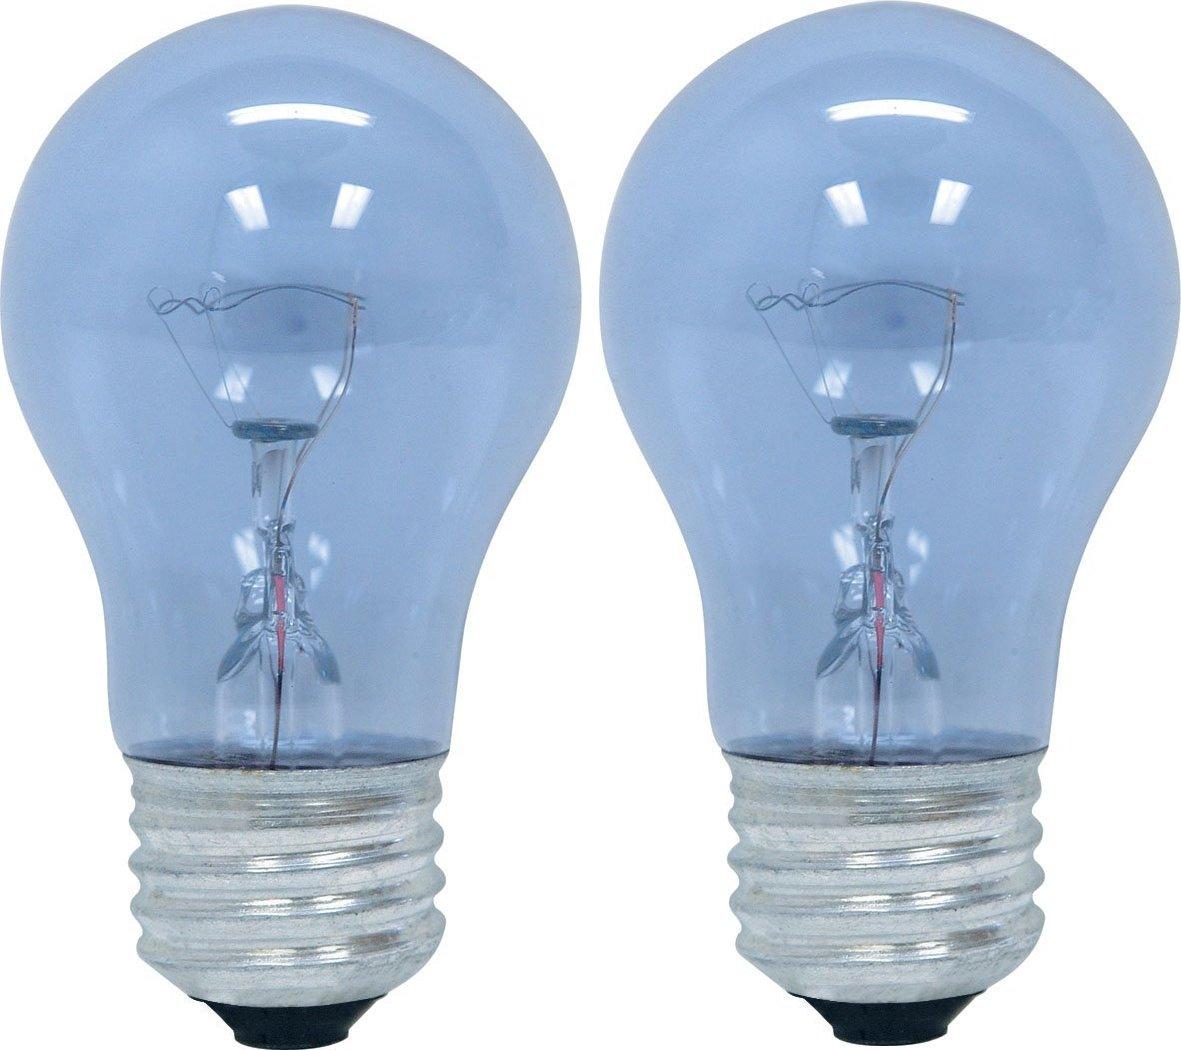 GE Appliance 21188 40-Watt, 415-Lumen A15 Light Bulb with Medium Base, 2-Pack GE Lighting